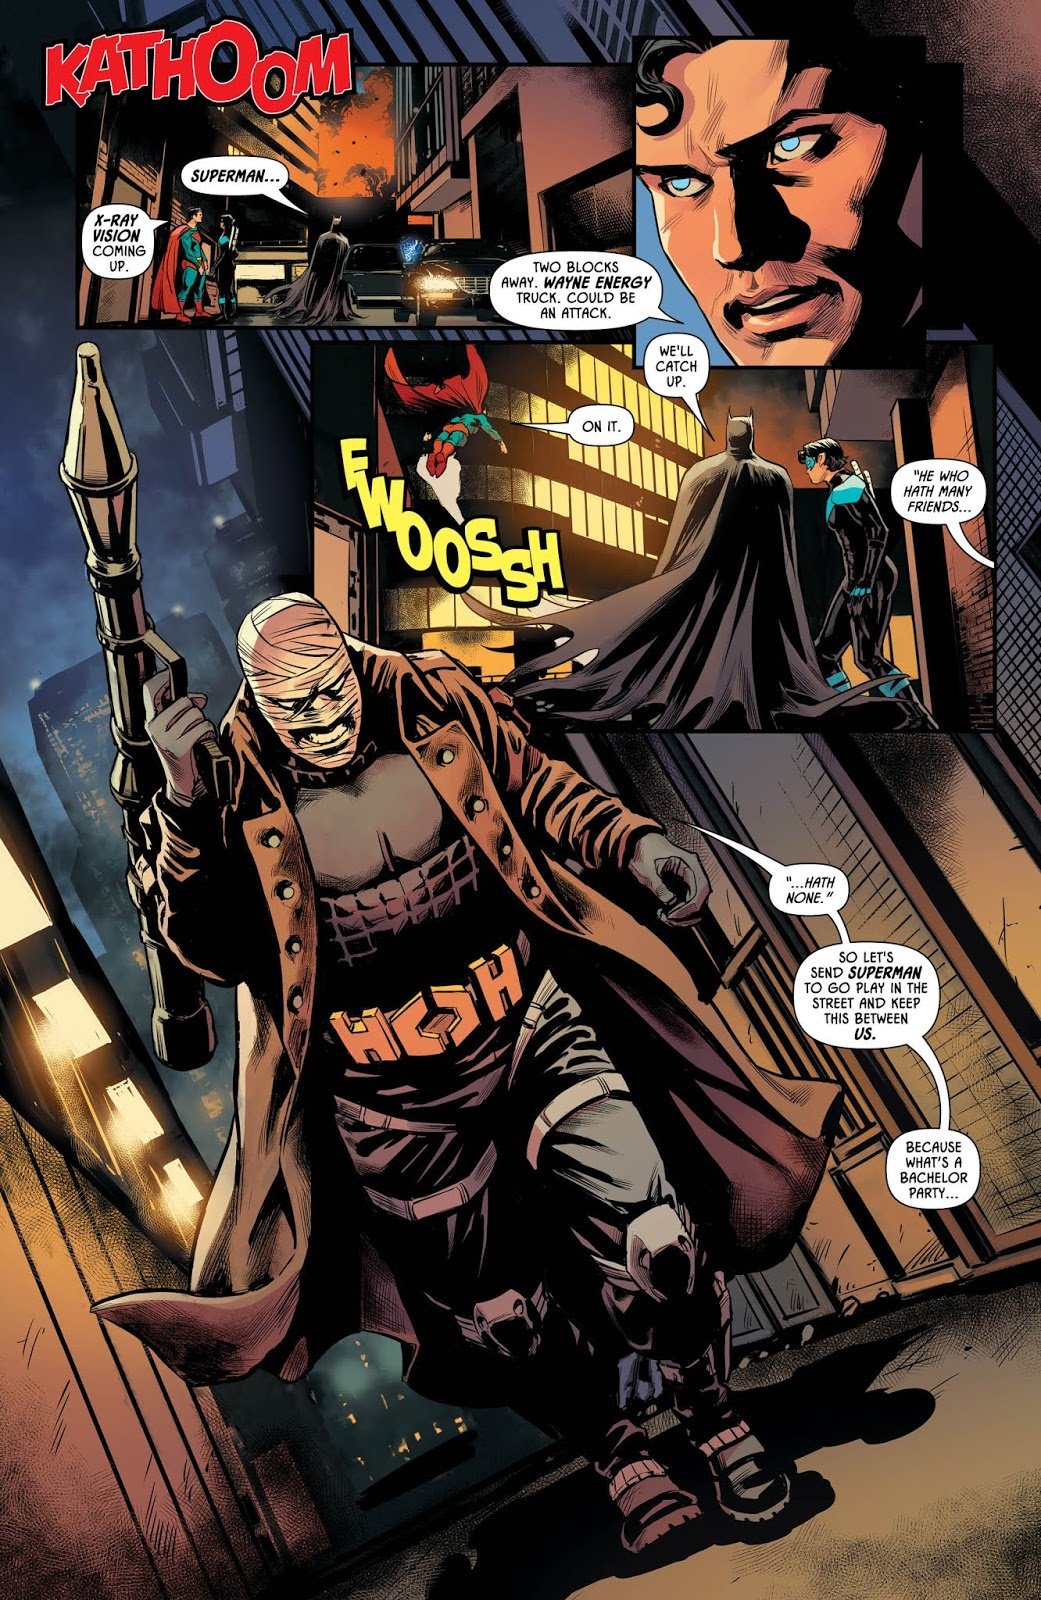 Batman Catwoman Batman Prelude to the Wedding Nightwing vs 2018 DC Hush #1